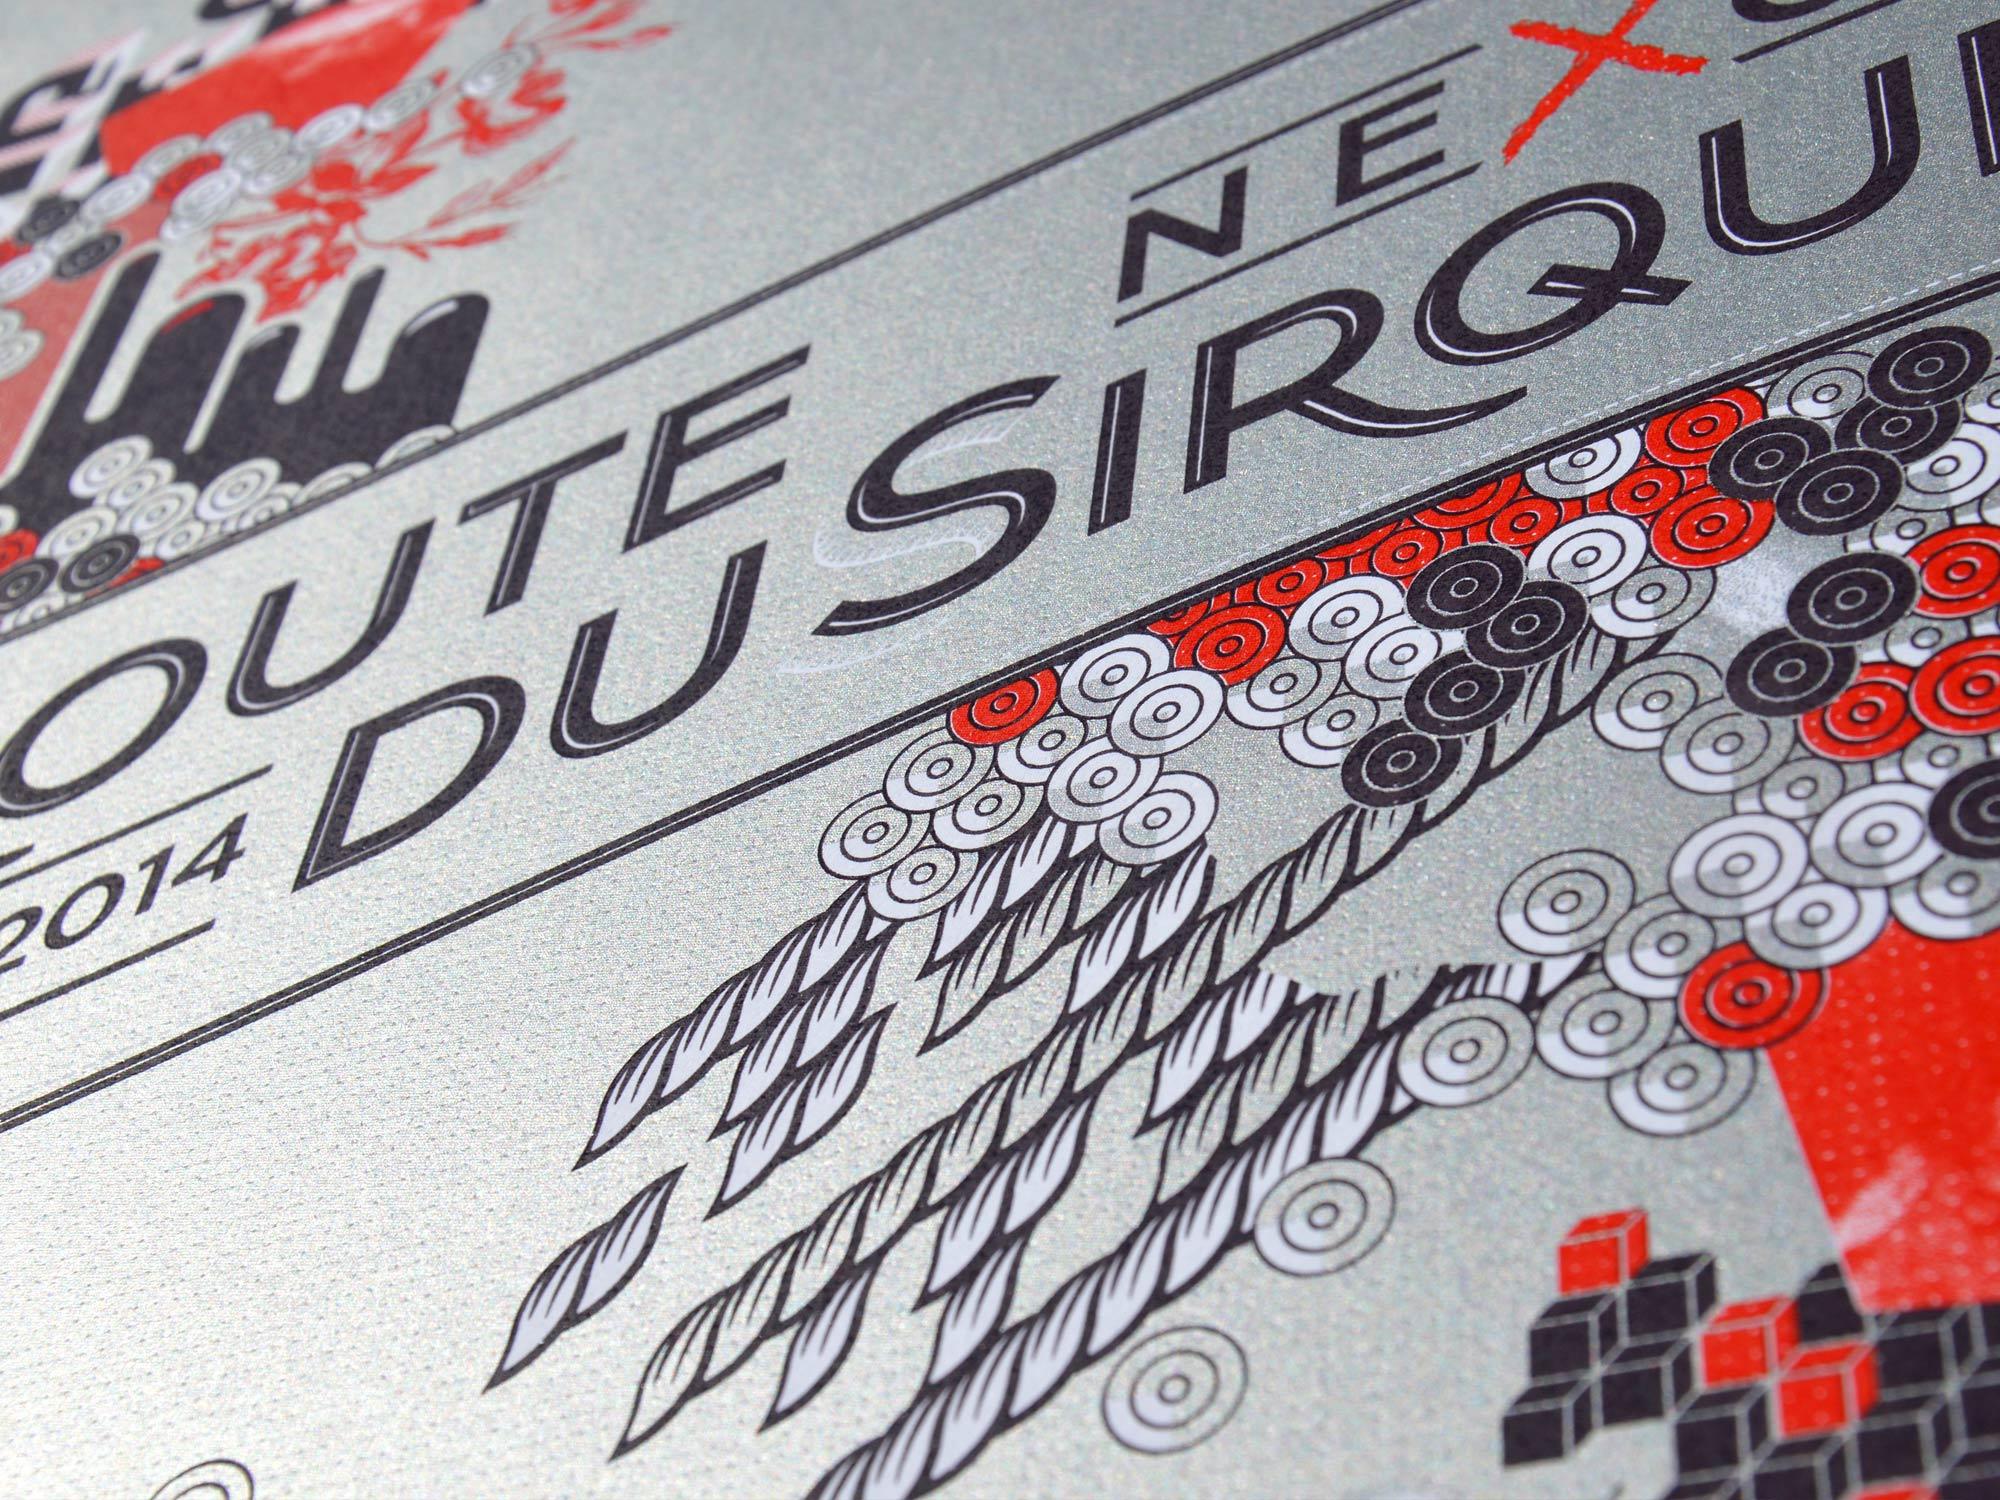 http://a-aa.fr/projet/affiche-collector-route-du-sirque-2014/